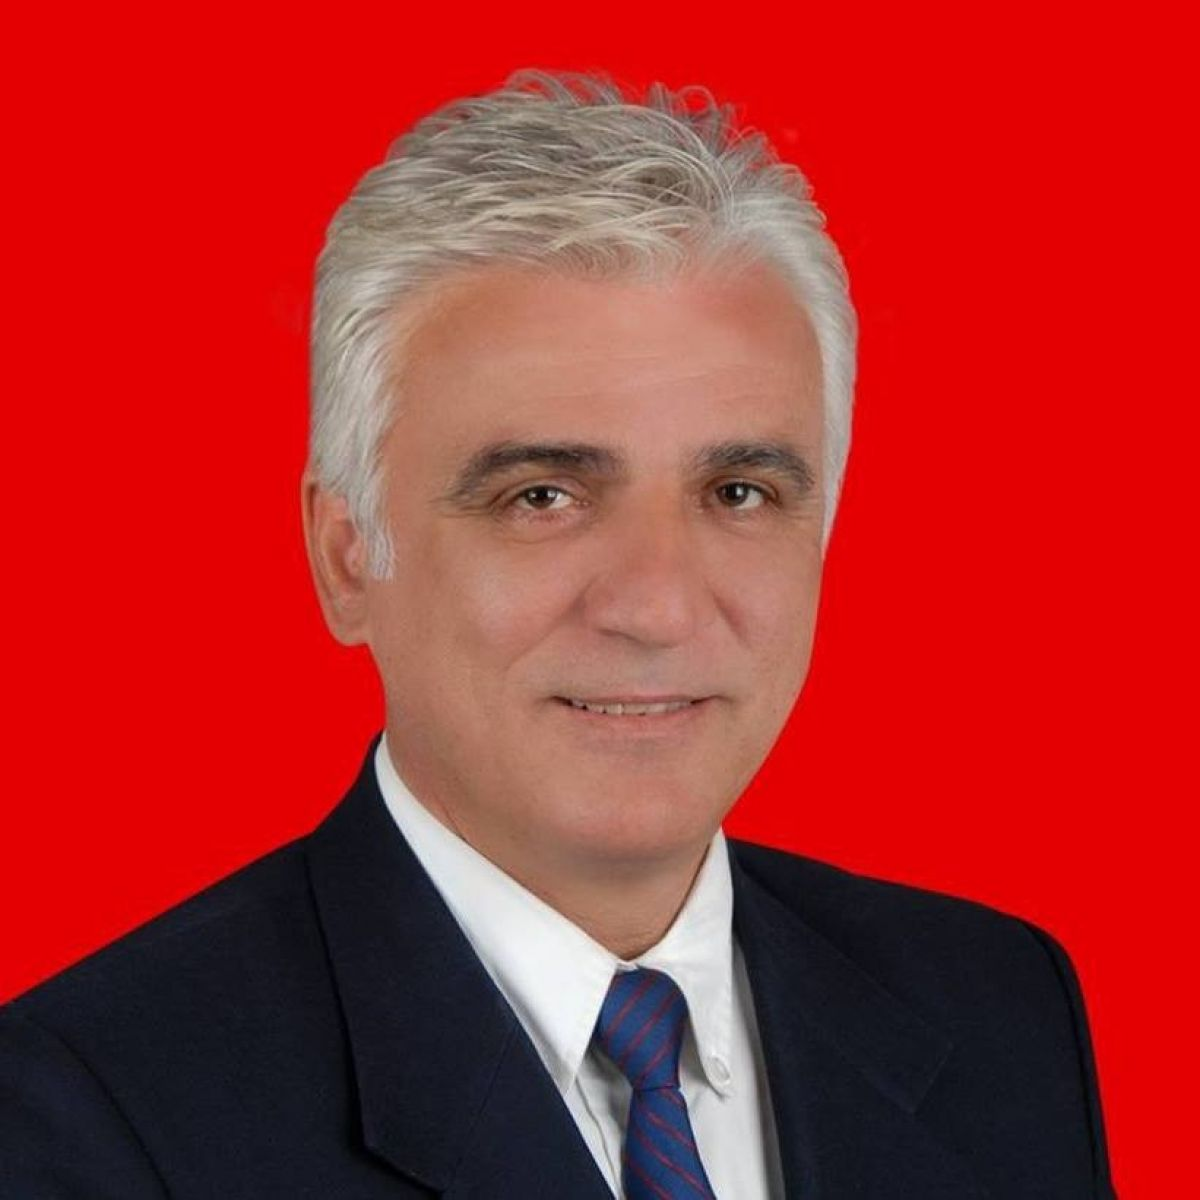 Antalya da CHP li başkanın katil zanlısı yakalandı #3